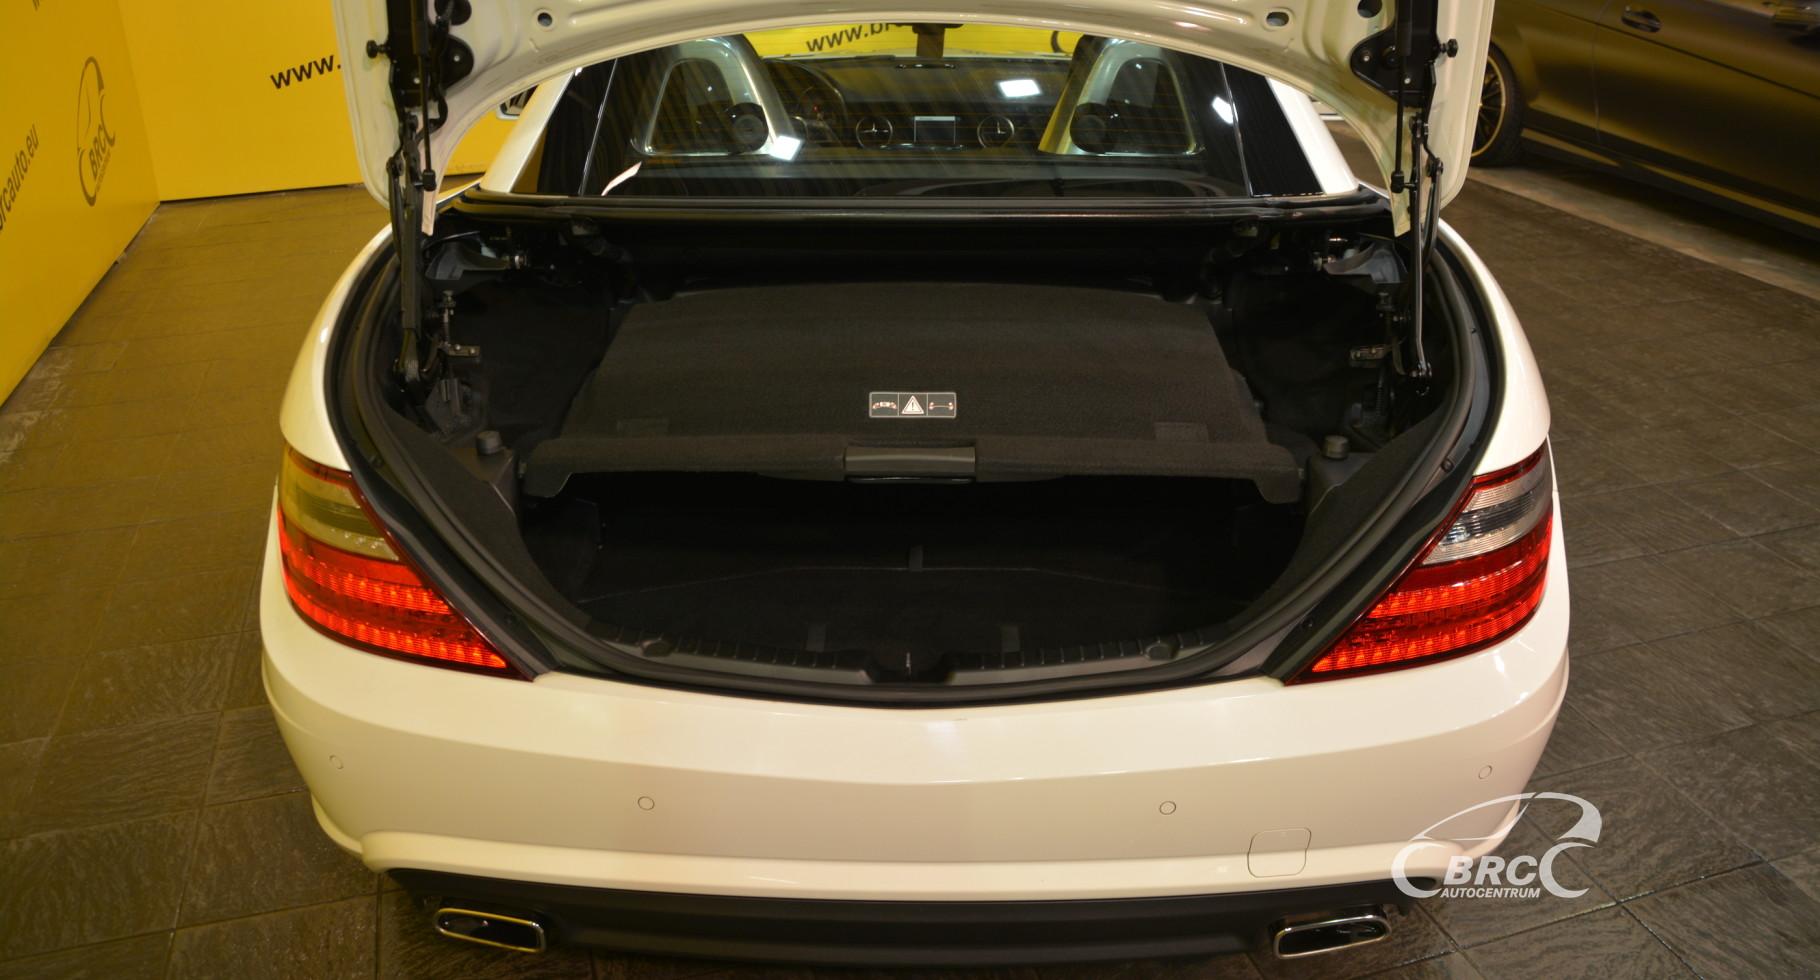 Mercedes-Benz SLK 250 CDI Carbon Look Edition Automatas